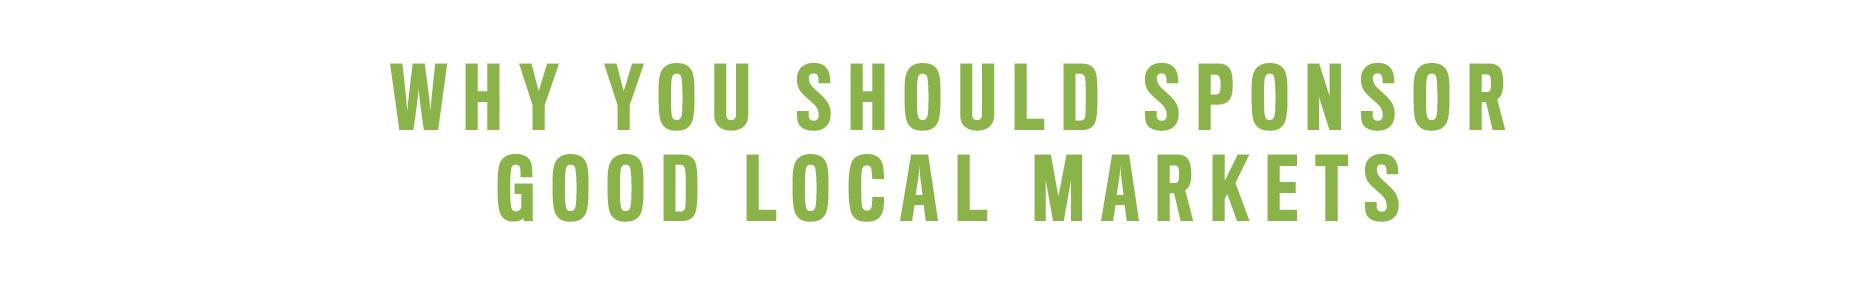 GLM-SponsorPacket-Why-You-Should-Header.jpg